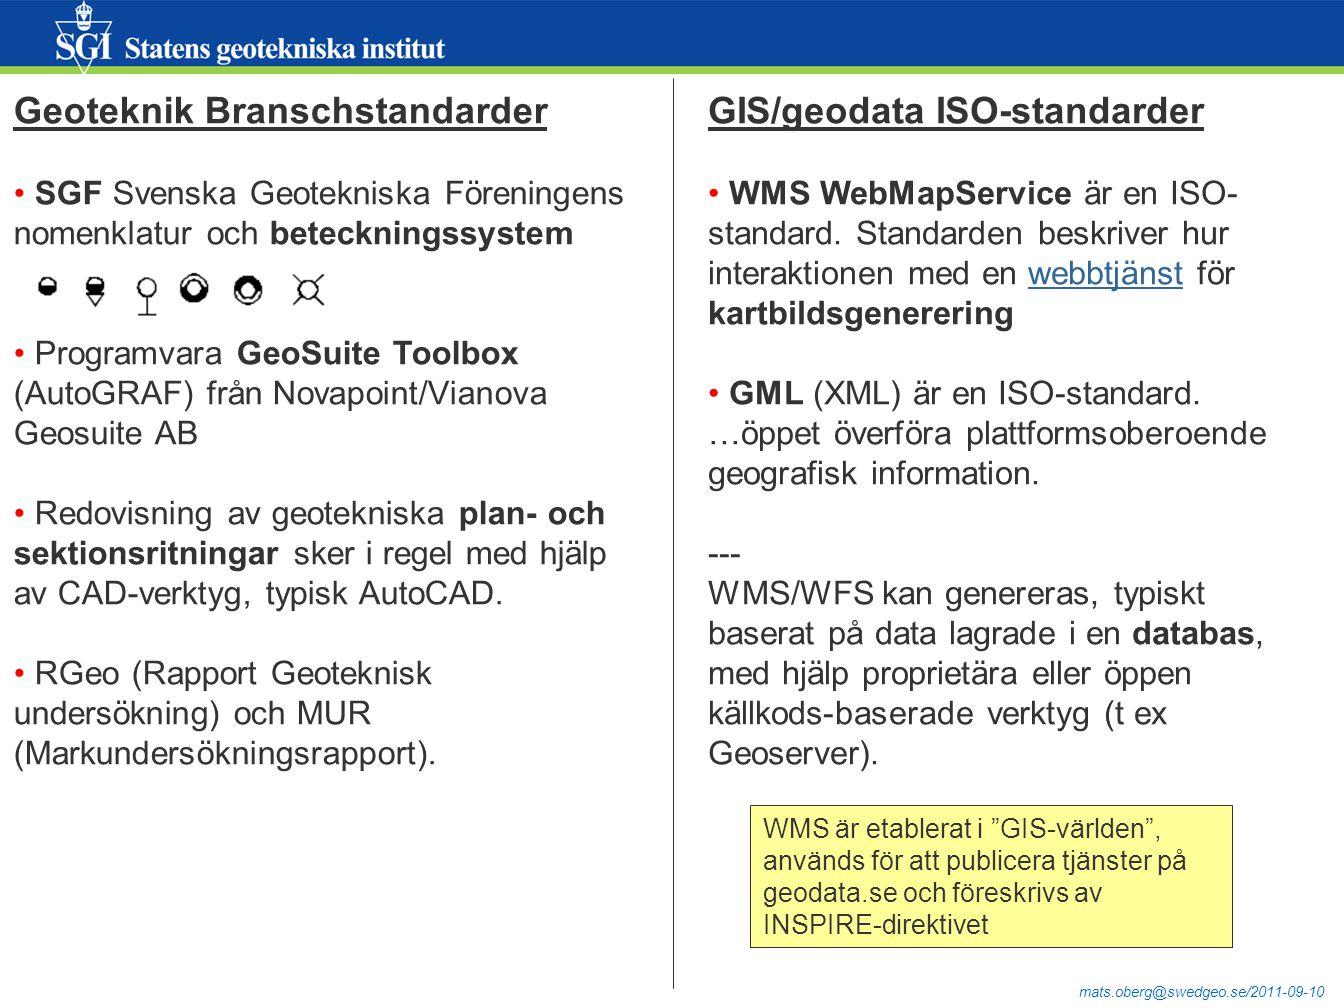 Geoteknik Branschstandarder GIS/geodata ISO-standarder